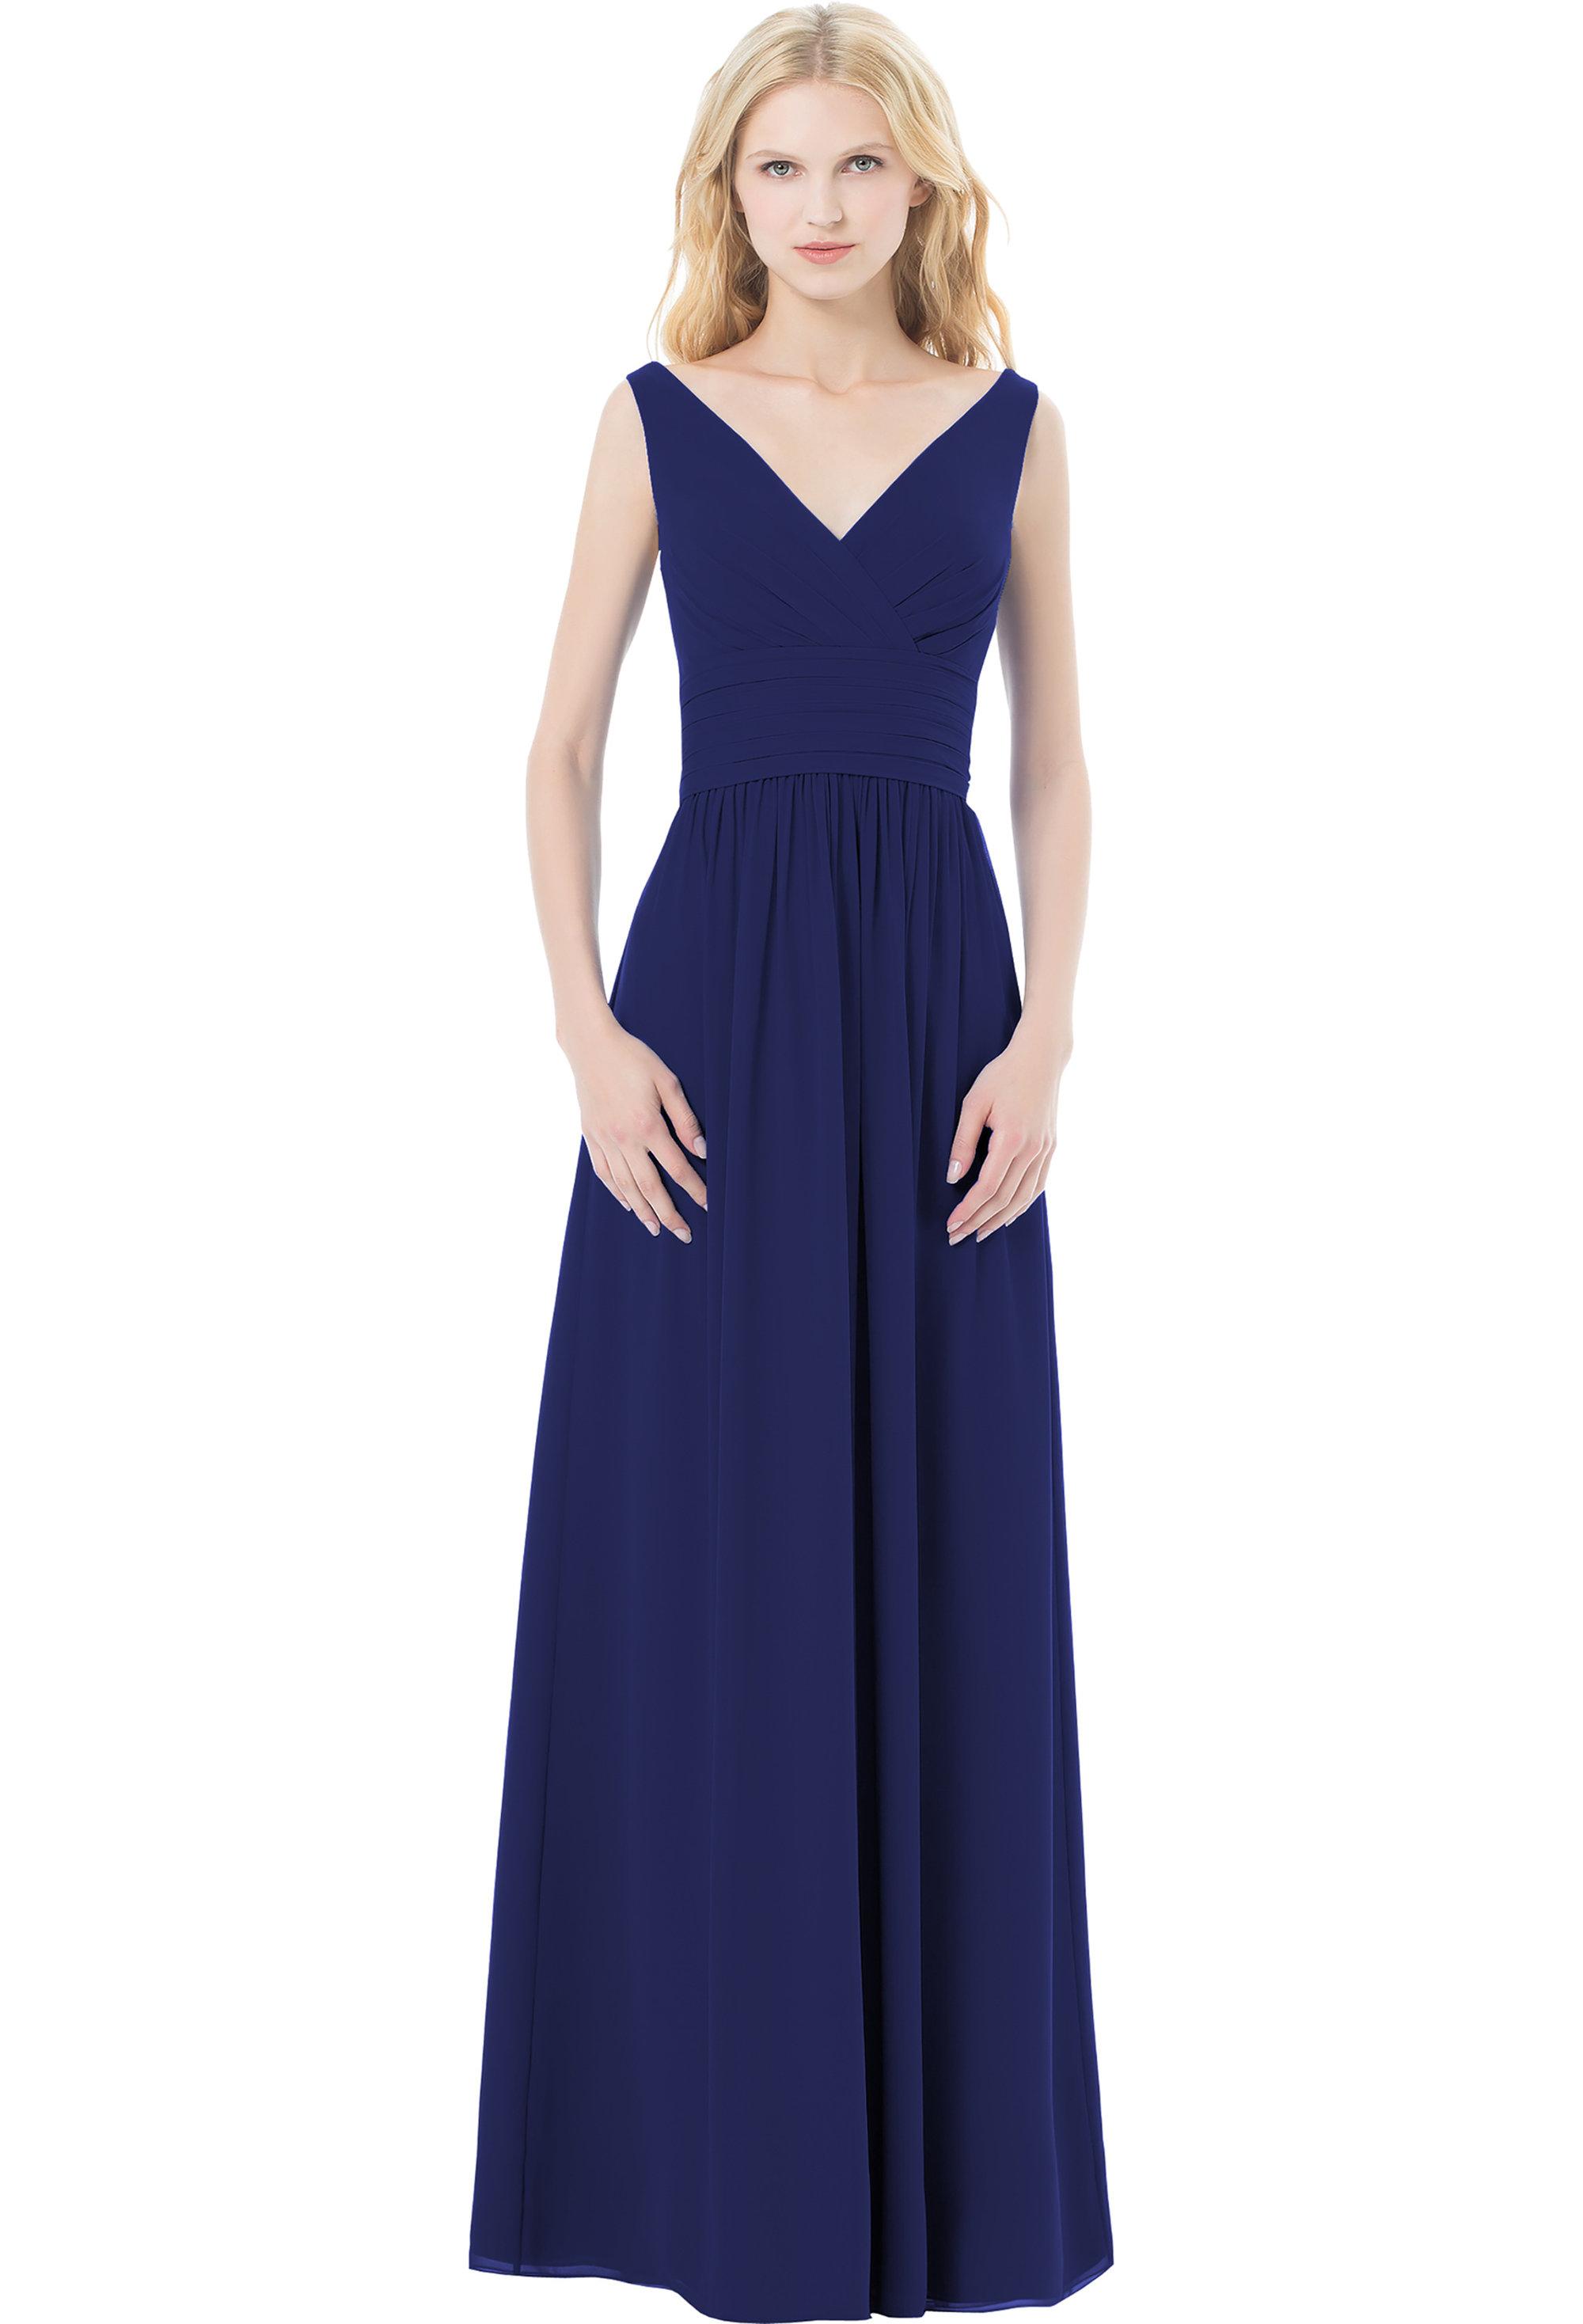 Bill Levkoff MARINE Chiffon Sleeveless A-line gown, $220.00 Front